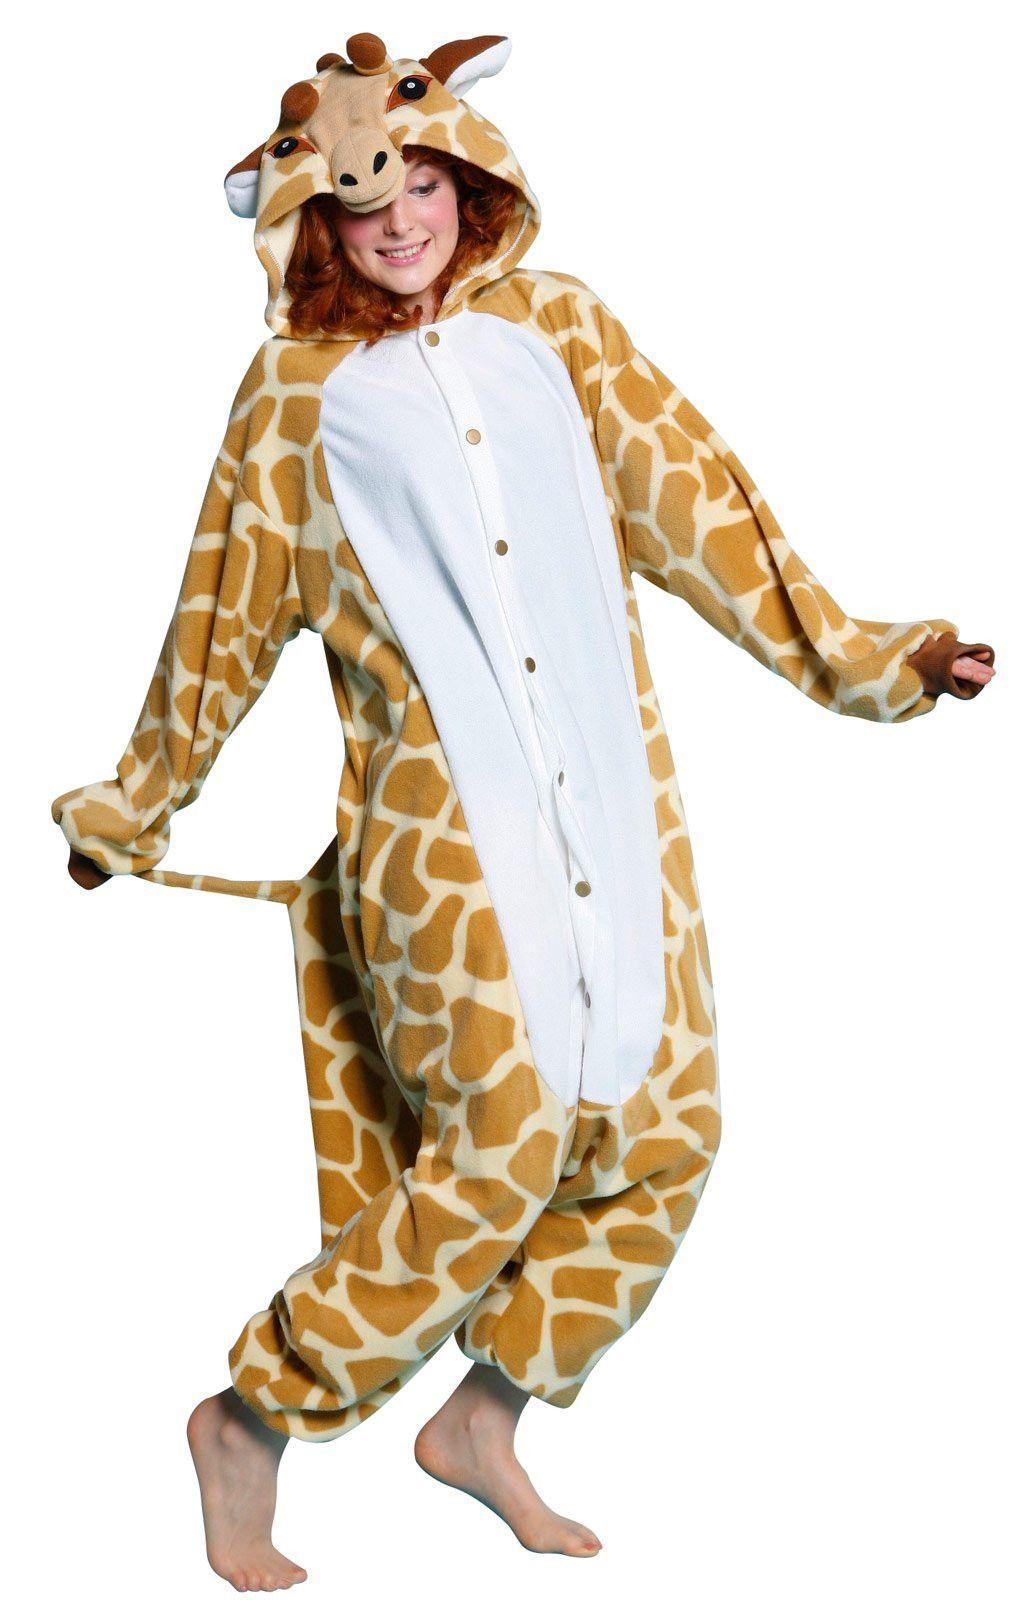 BCozy Giraffe Adult Costume  sc 1 st  Pinterest & BCozy Giraffe Adult Costume | giraffe costumes | Pinterest | Giraffe ...